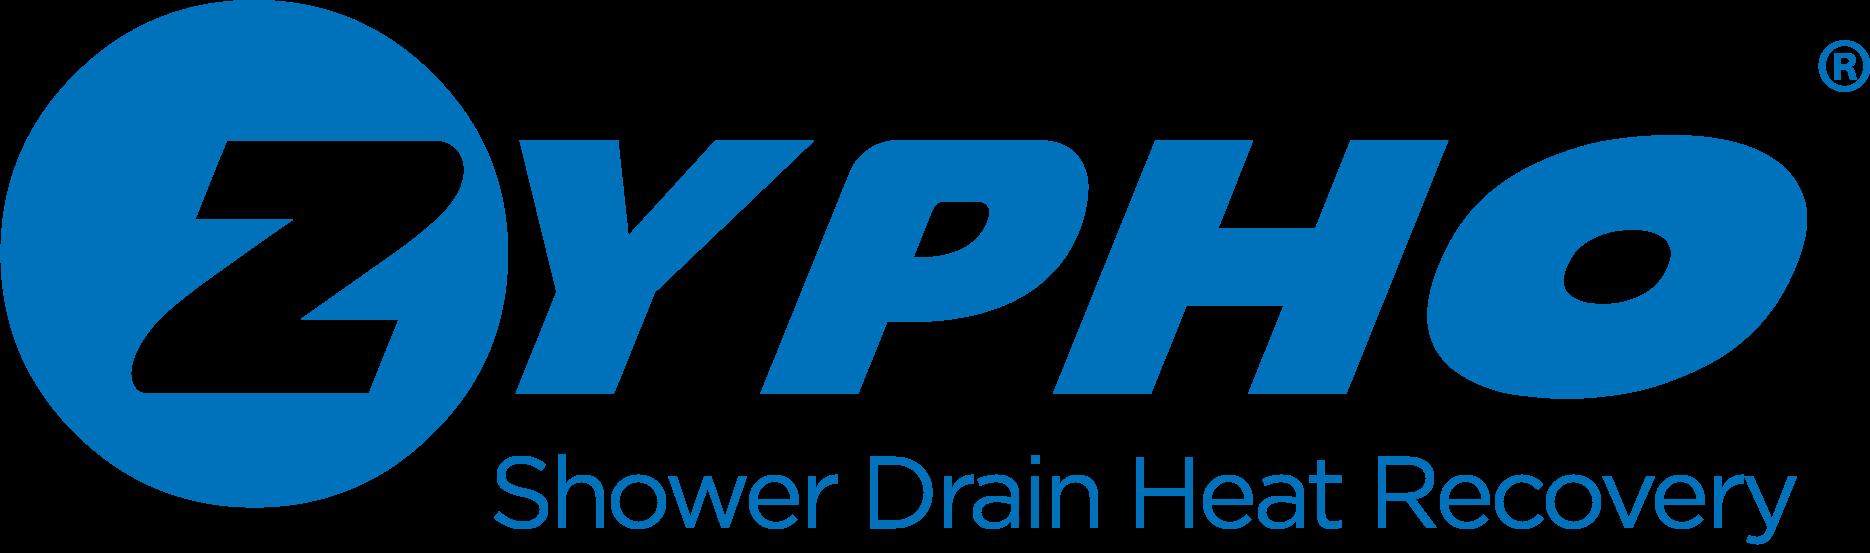 Zypho logo rekuperacja wody